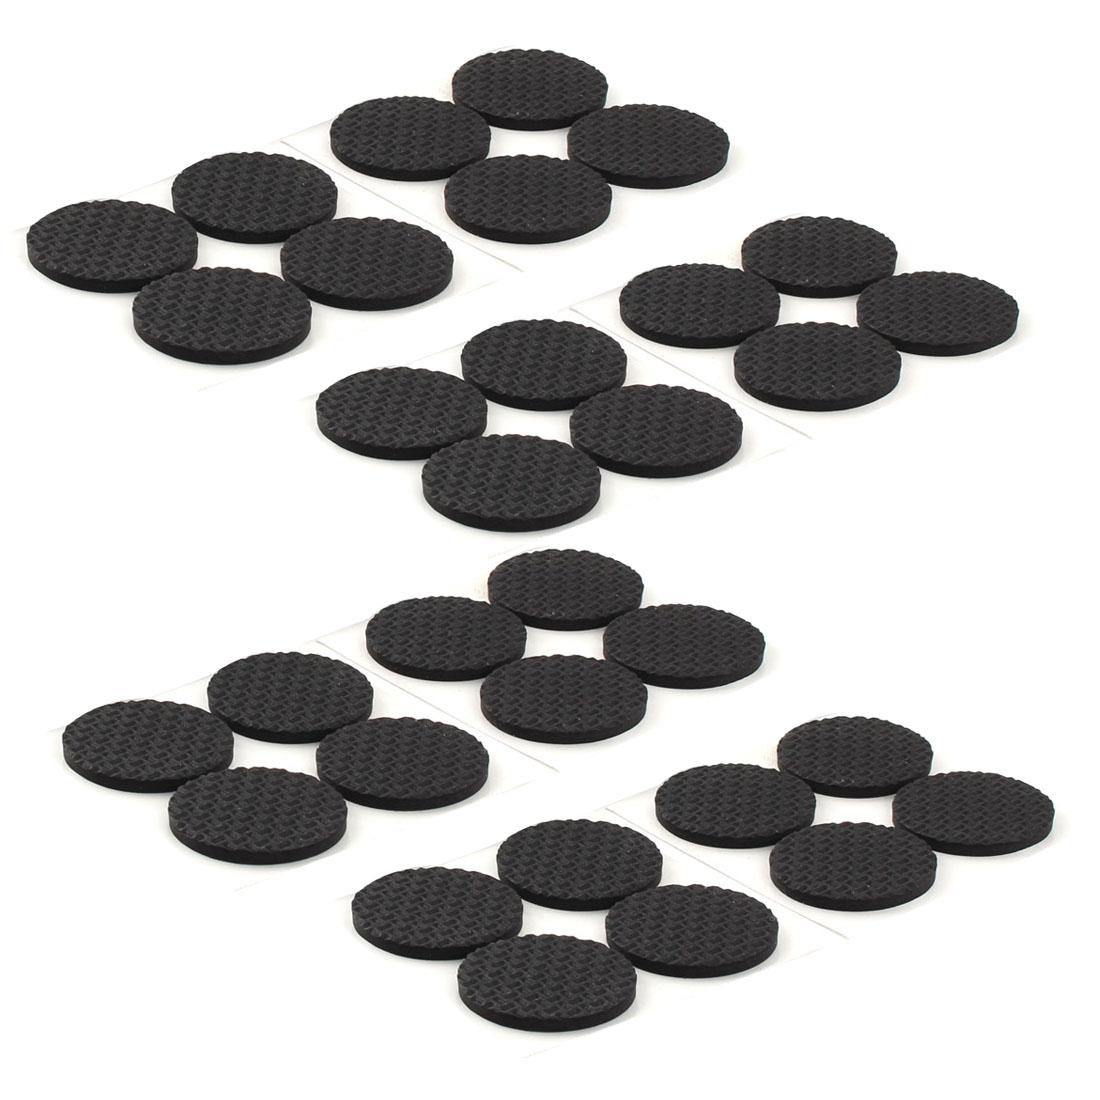 Office Round EVA Anti Slip Self Adhesive Furniture Foot Pads Cushions Black 38mm Dia 32pcs